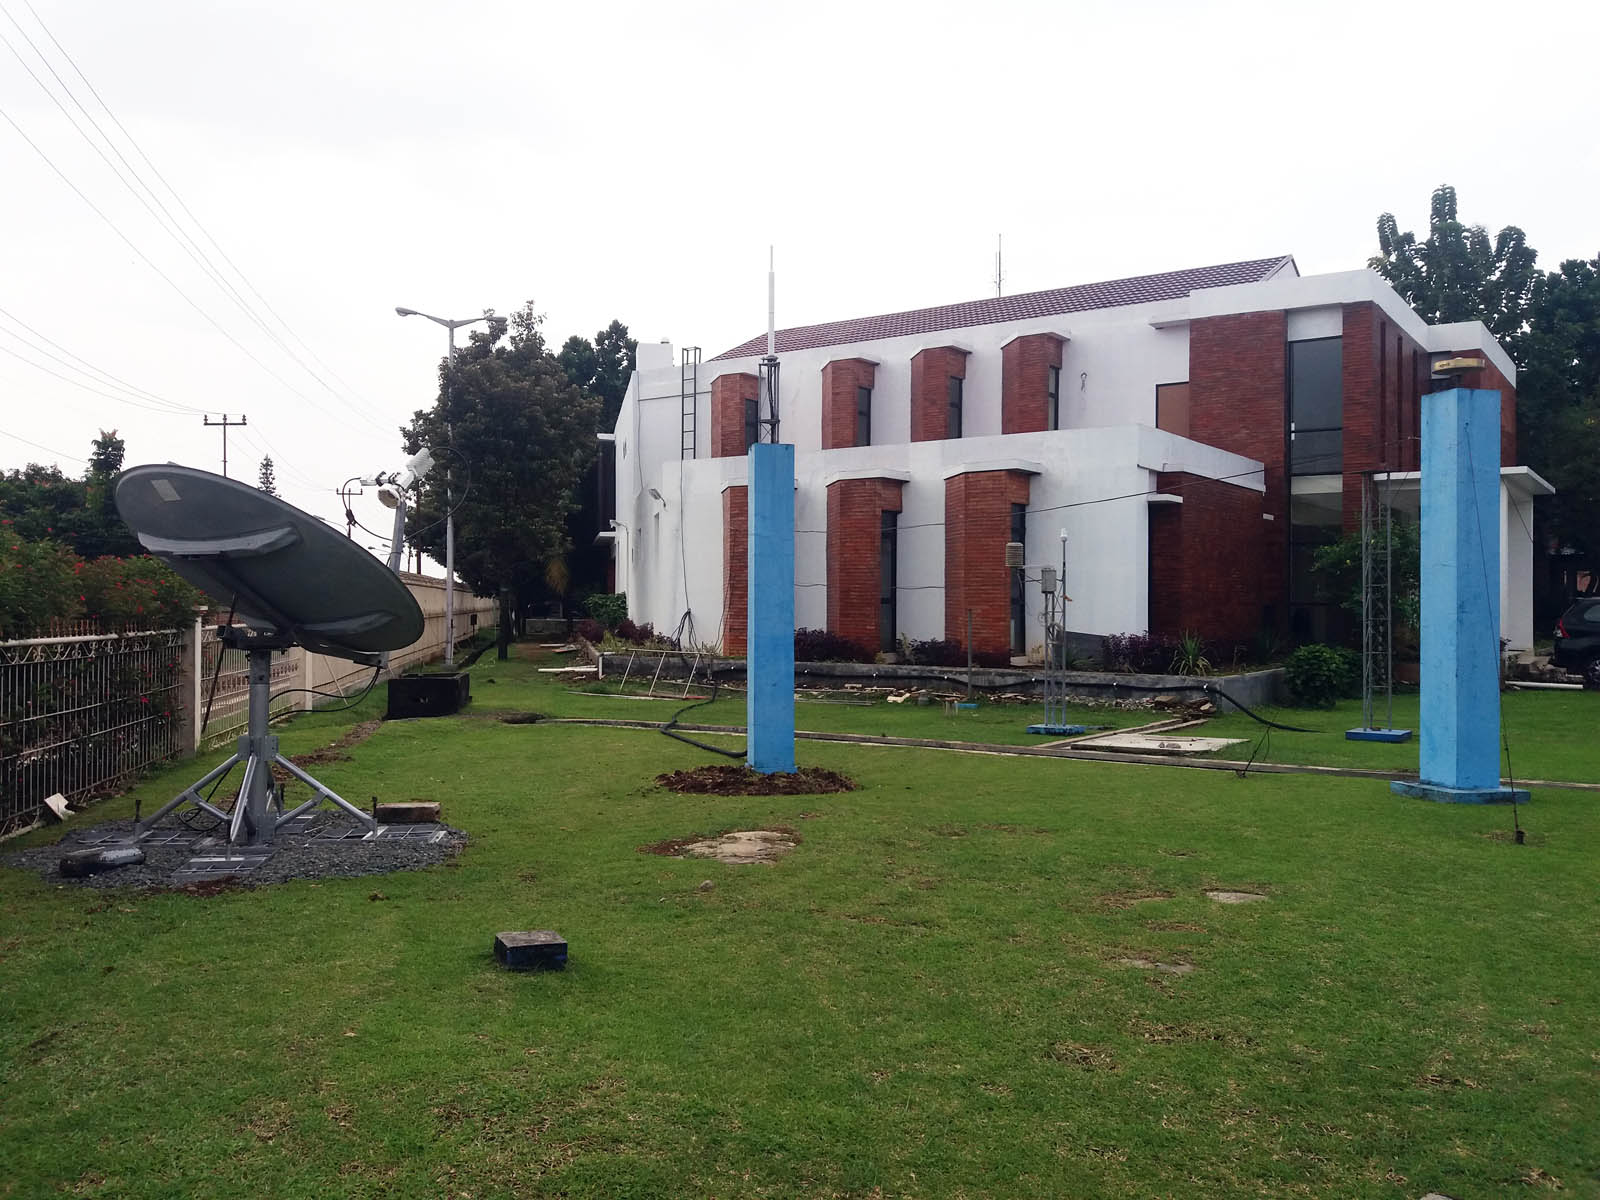 DORIS station: CIBINONG - INDONESIA